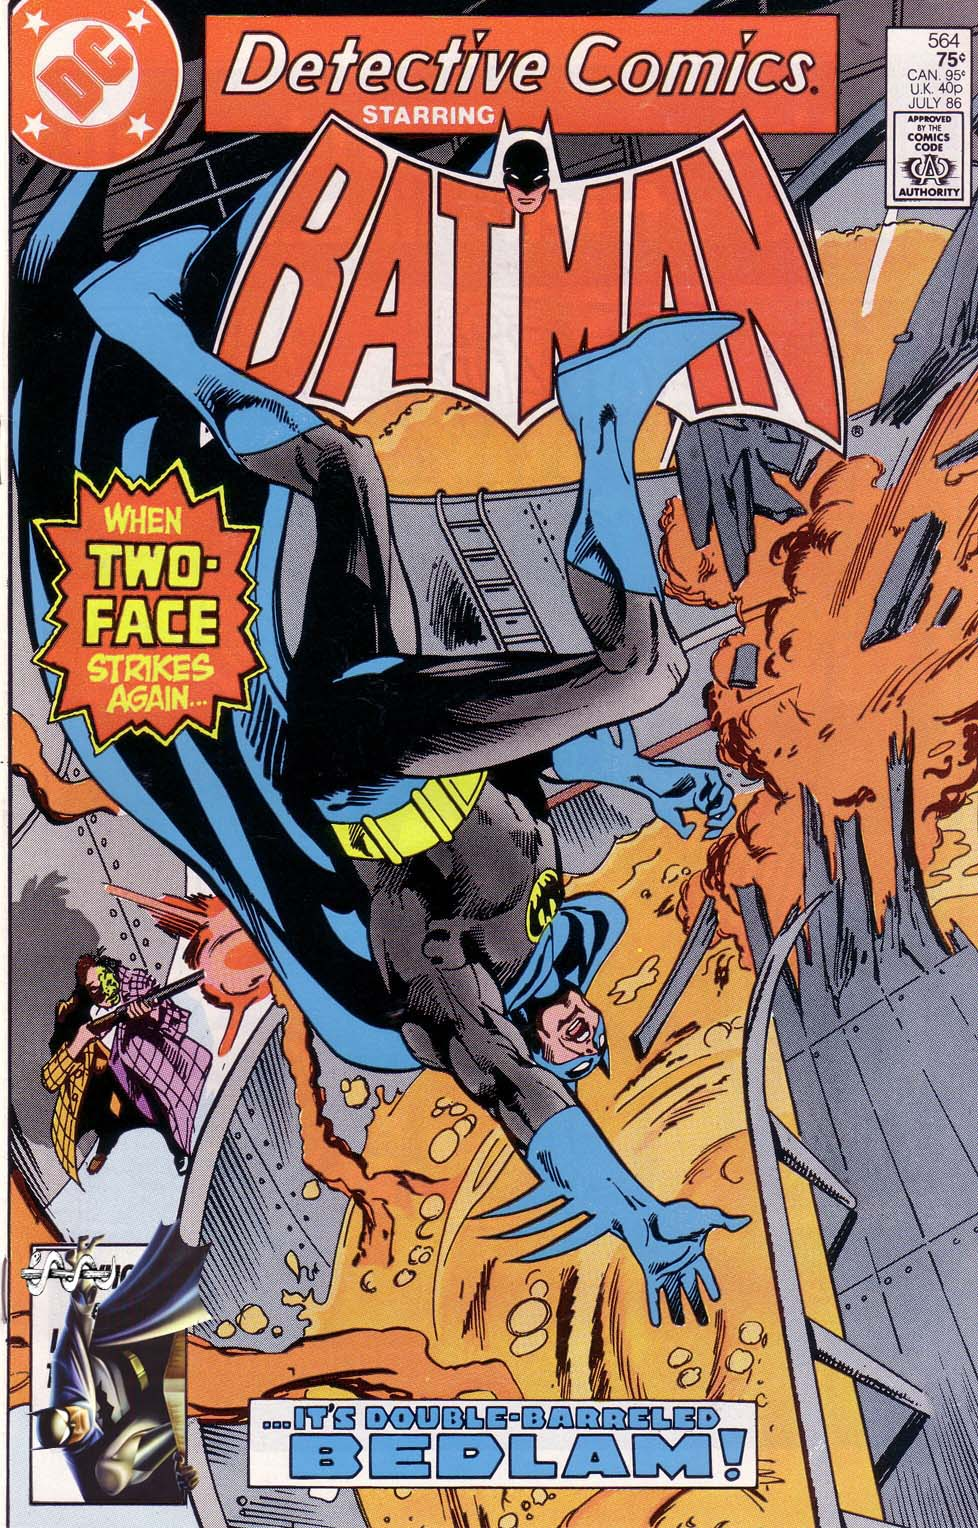 Detective Comics (1937) 564 Page 1